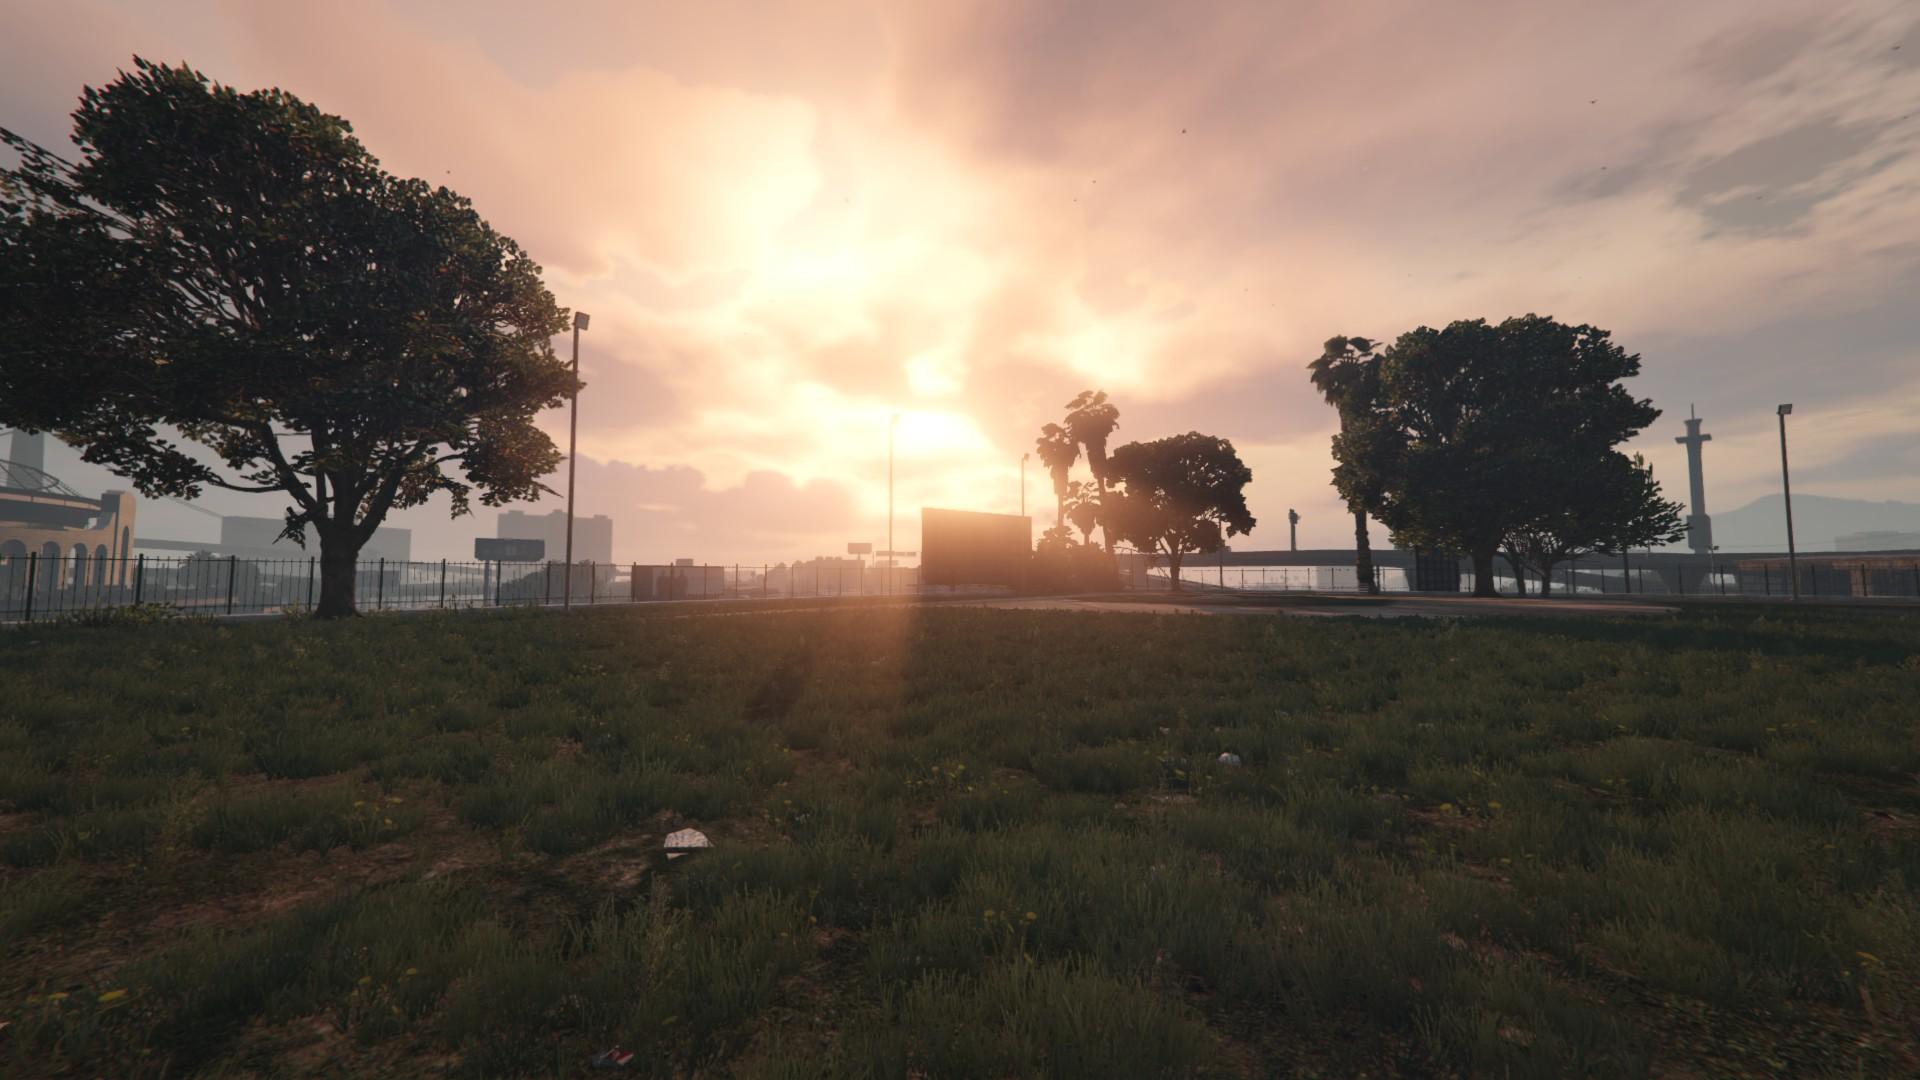 Grand Theft Auto V Full HD Fond d'écran and Arrière-Plan | 1920x1080 | ID:627703